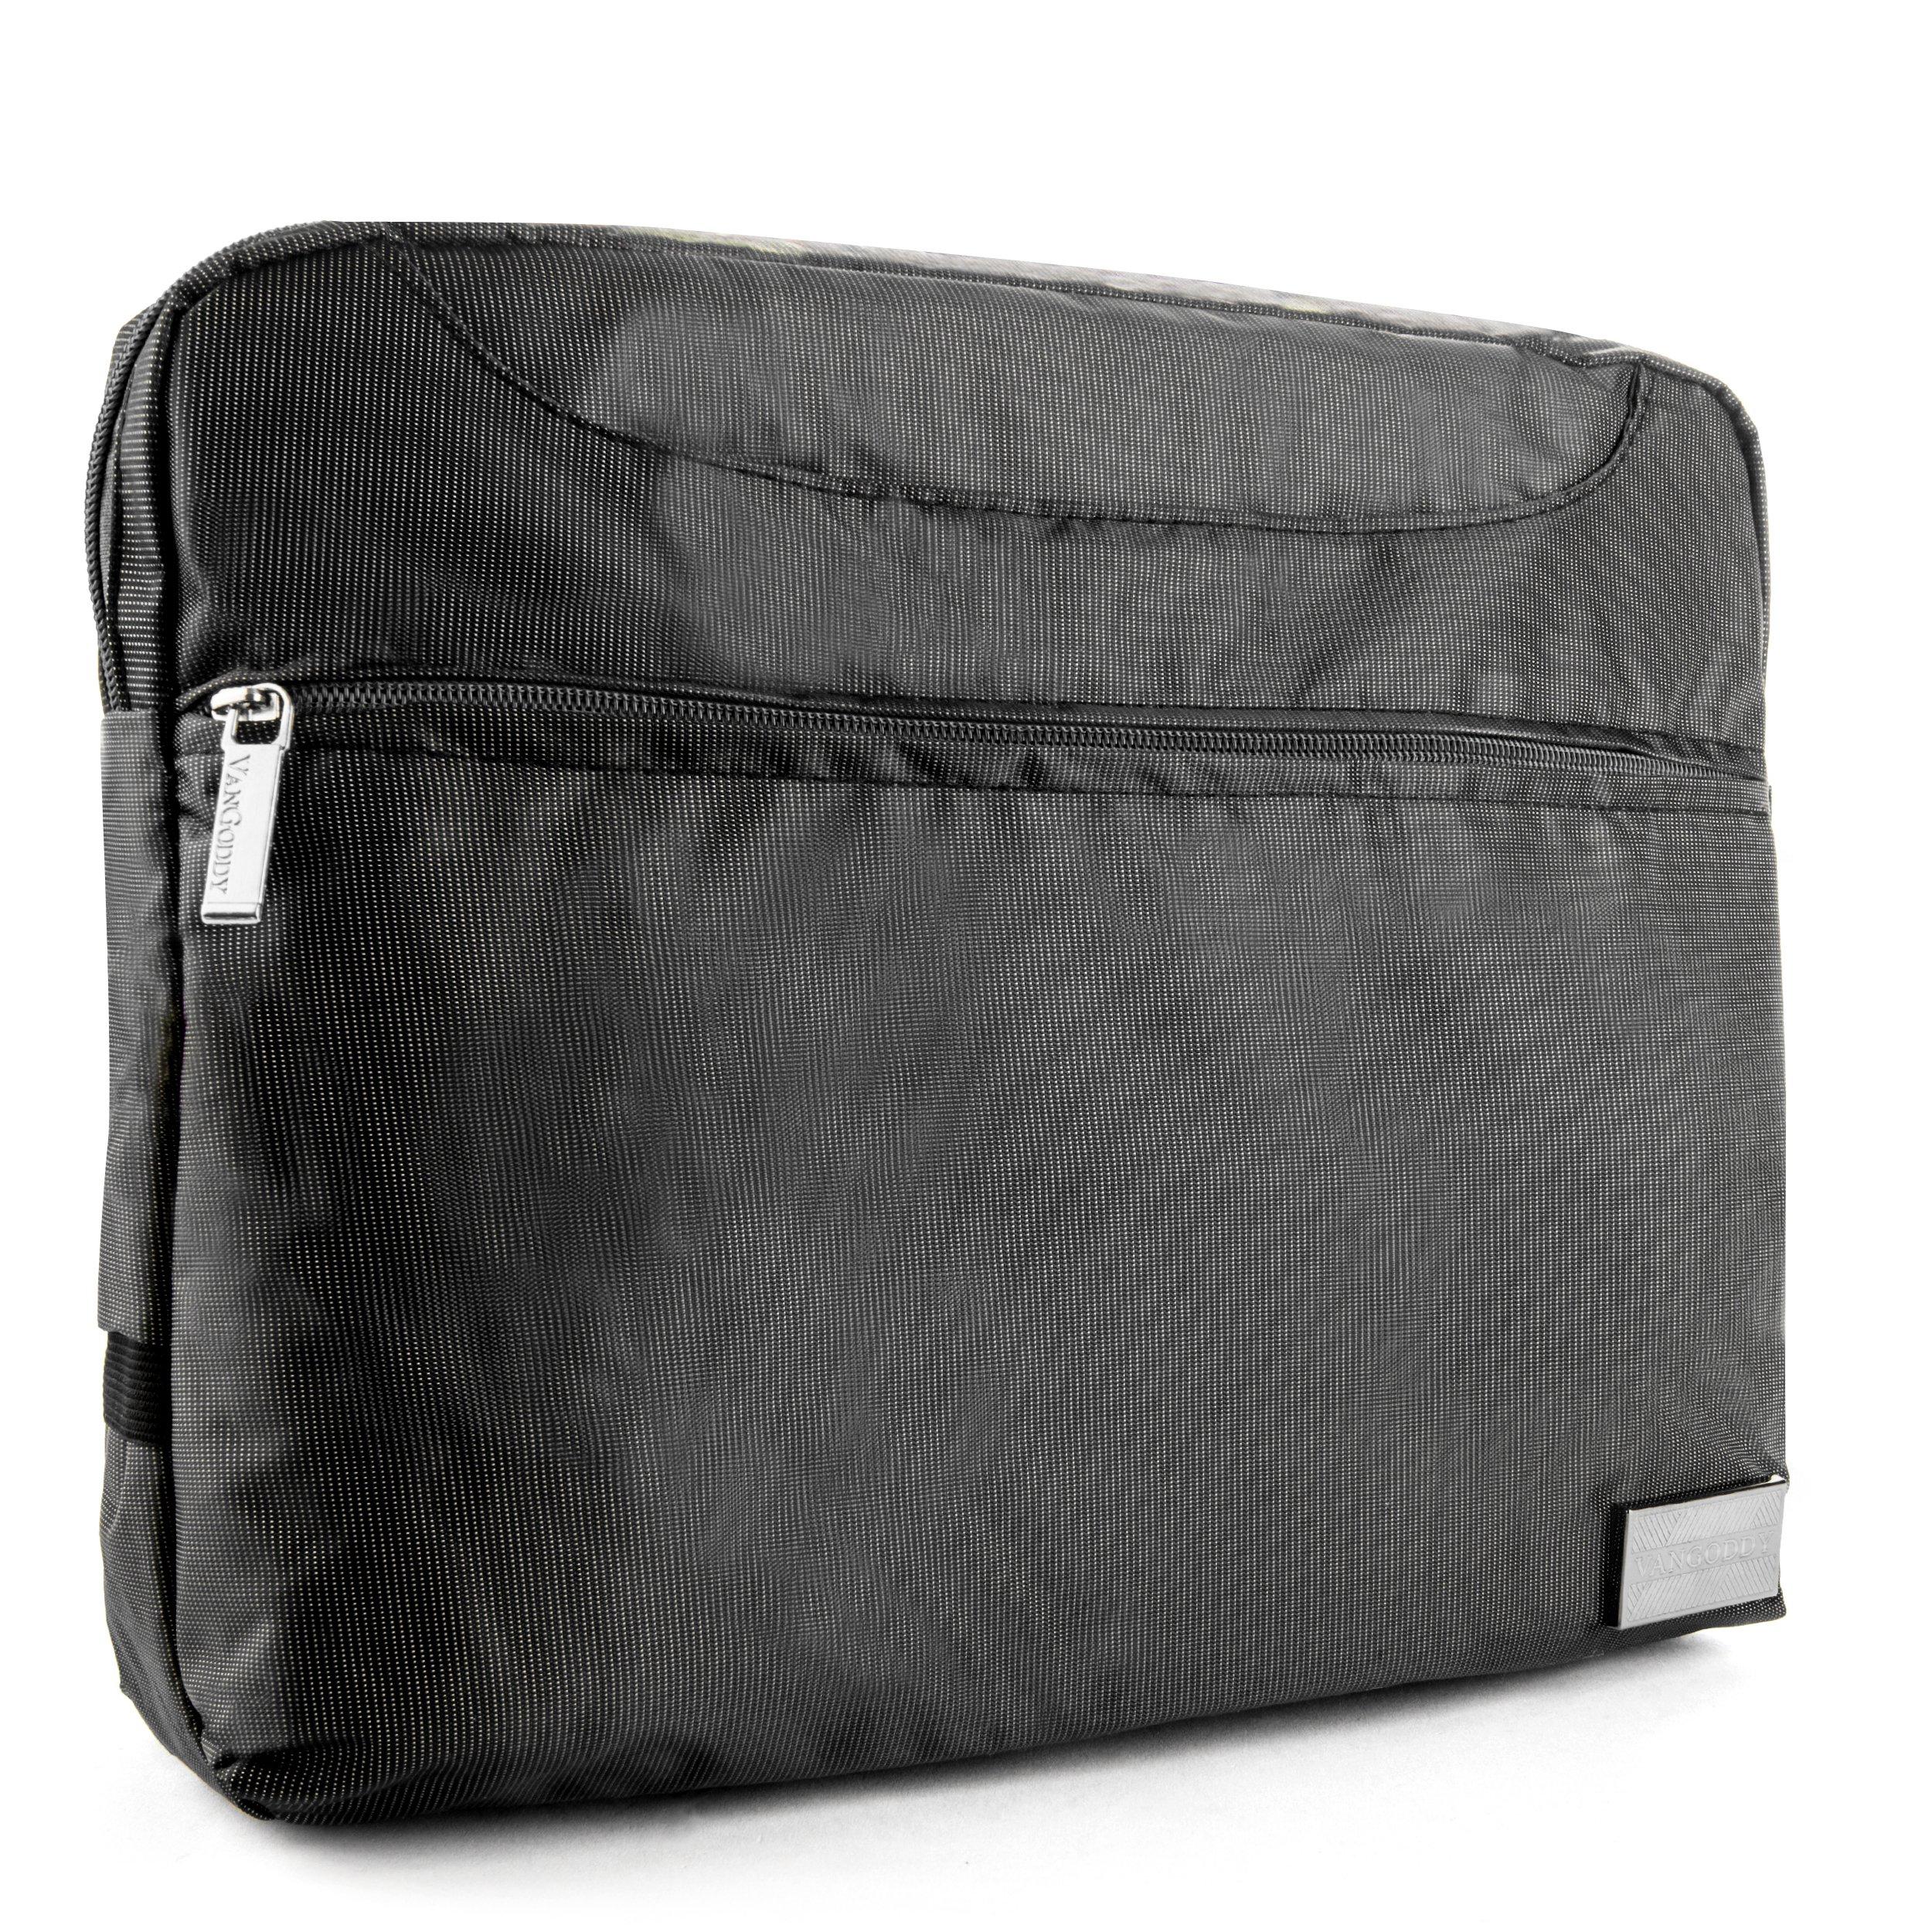 VanGoddy NineO Slim Slate Grey Messenger Bag for Microsoft Surface Laptop / Surface Book / Surface Pro Series 11''-13.5in by Vangoddy (Image #7)